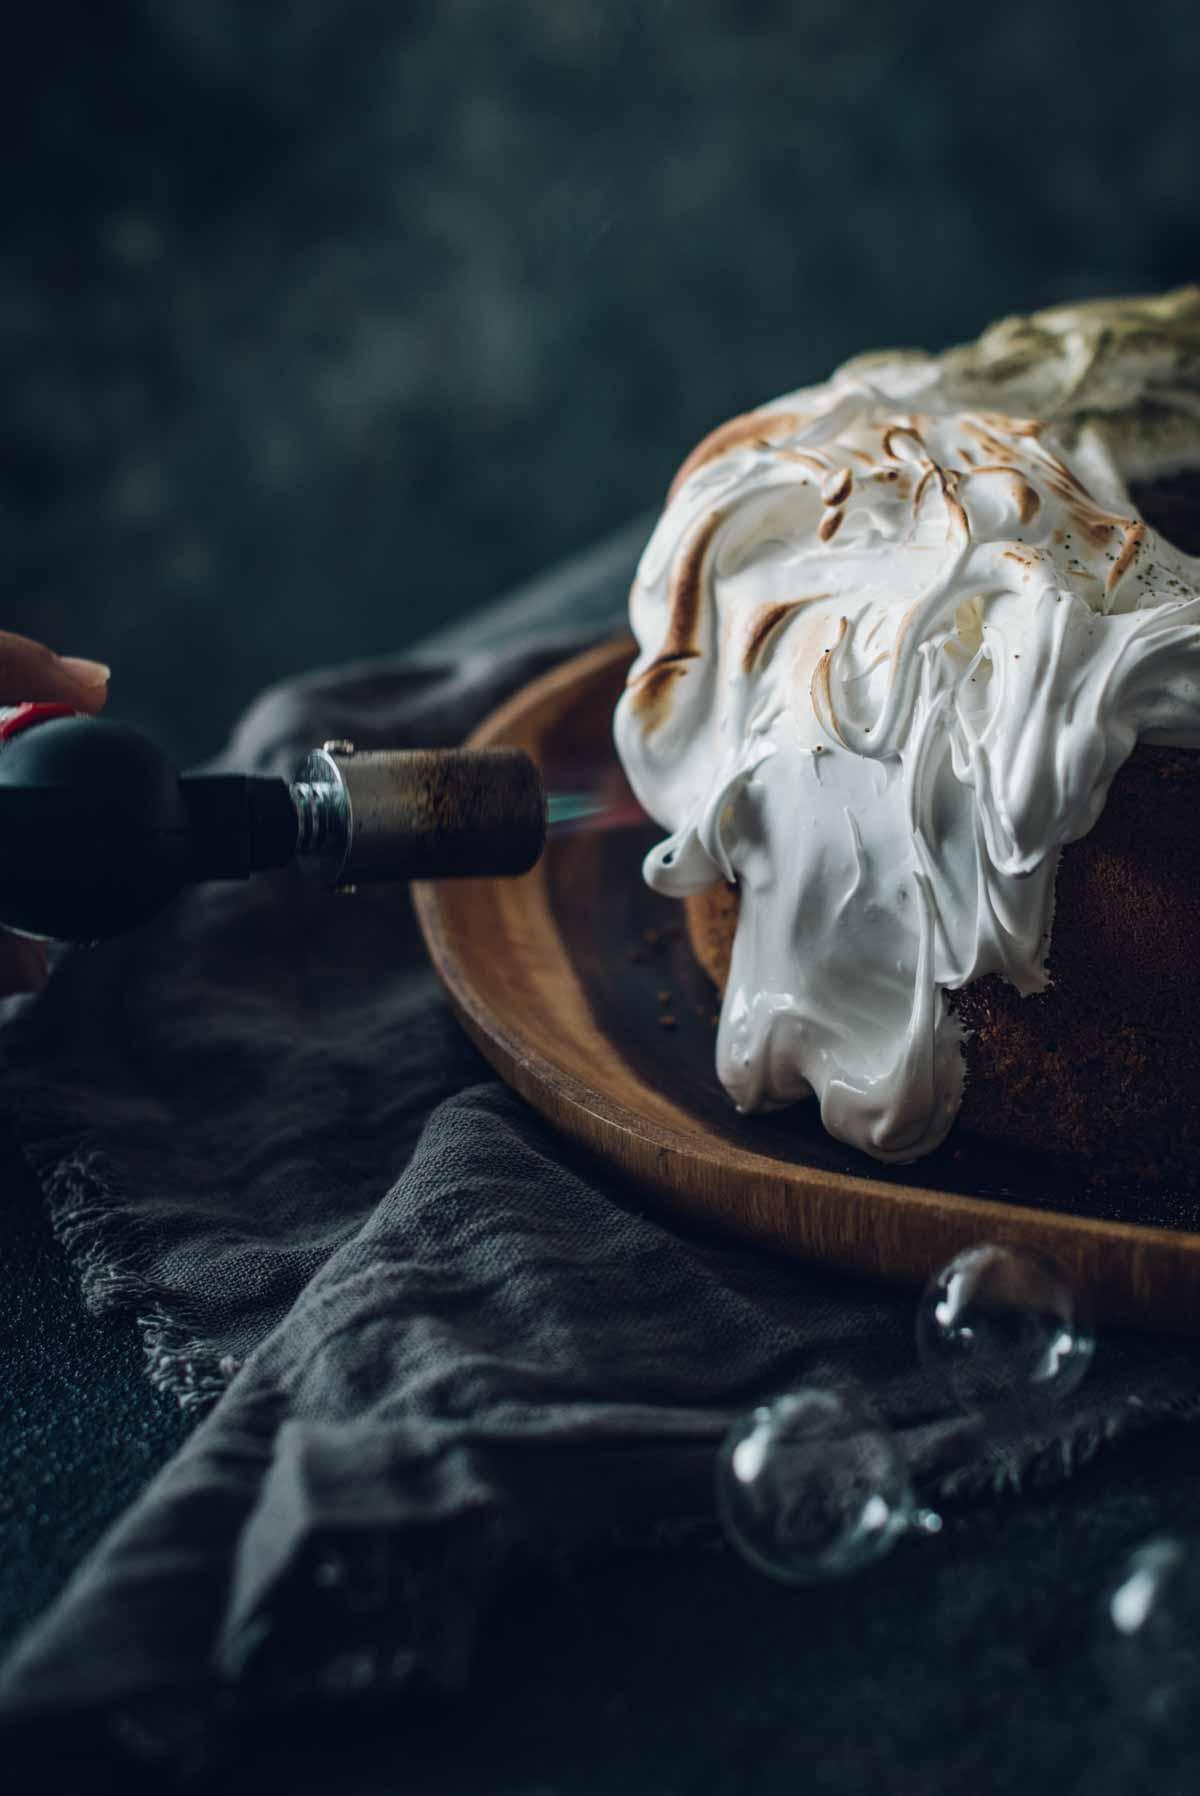 Black Sesame and Green Tea Chiffon Cake | Chew Town Food Blog